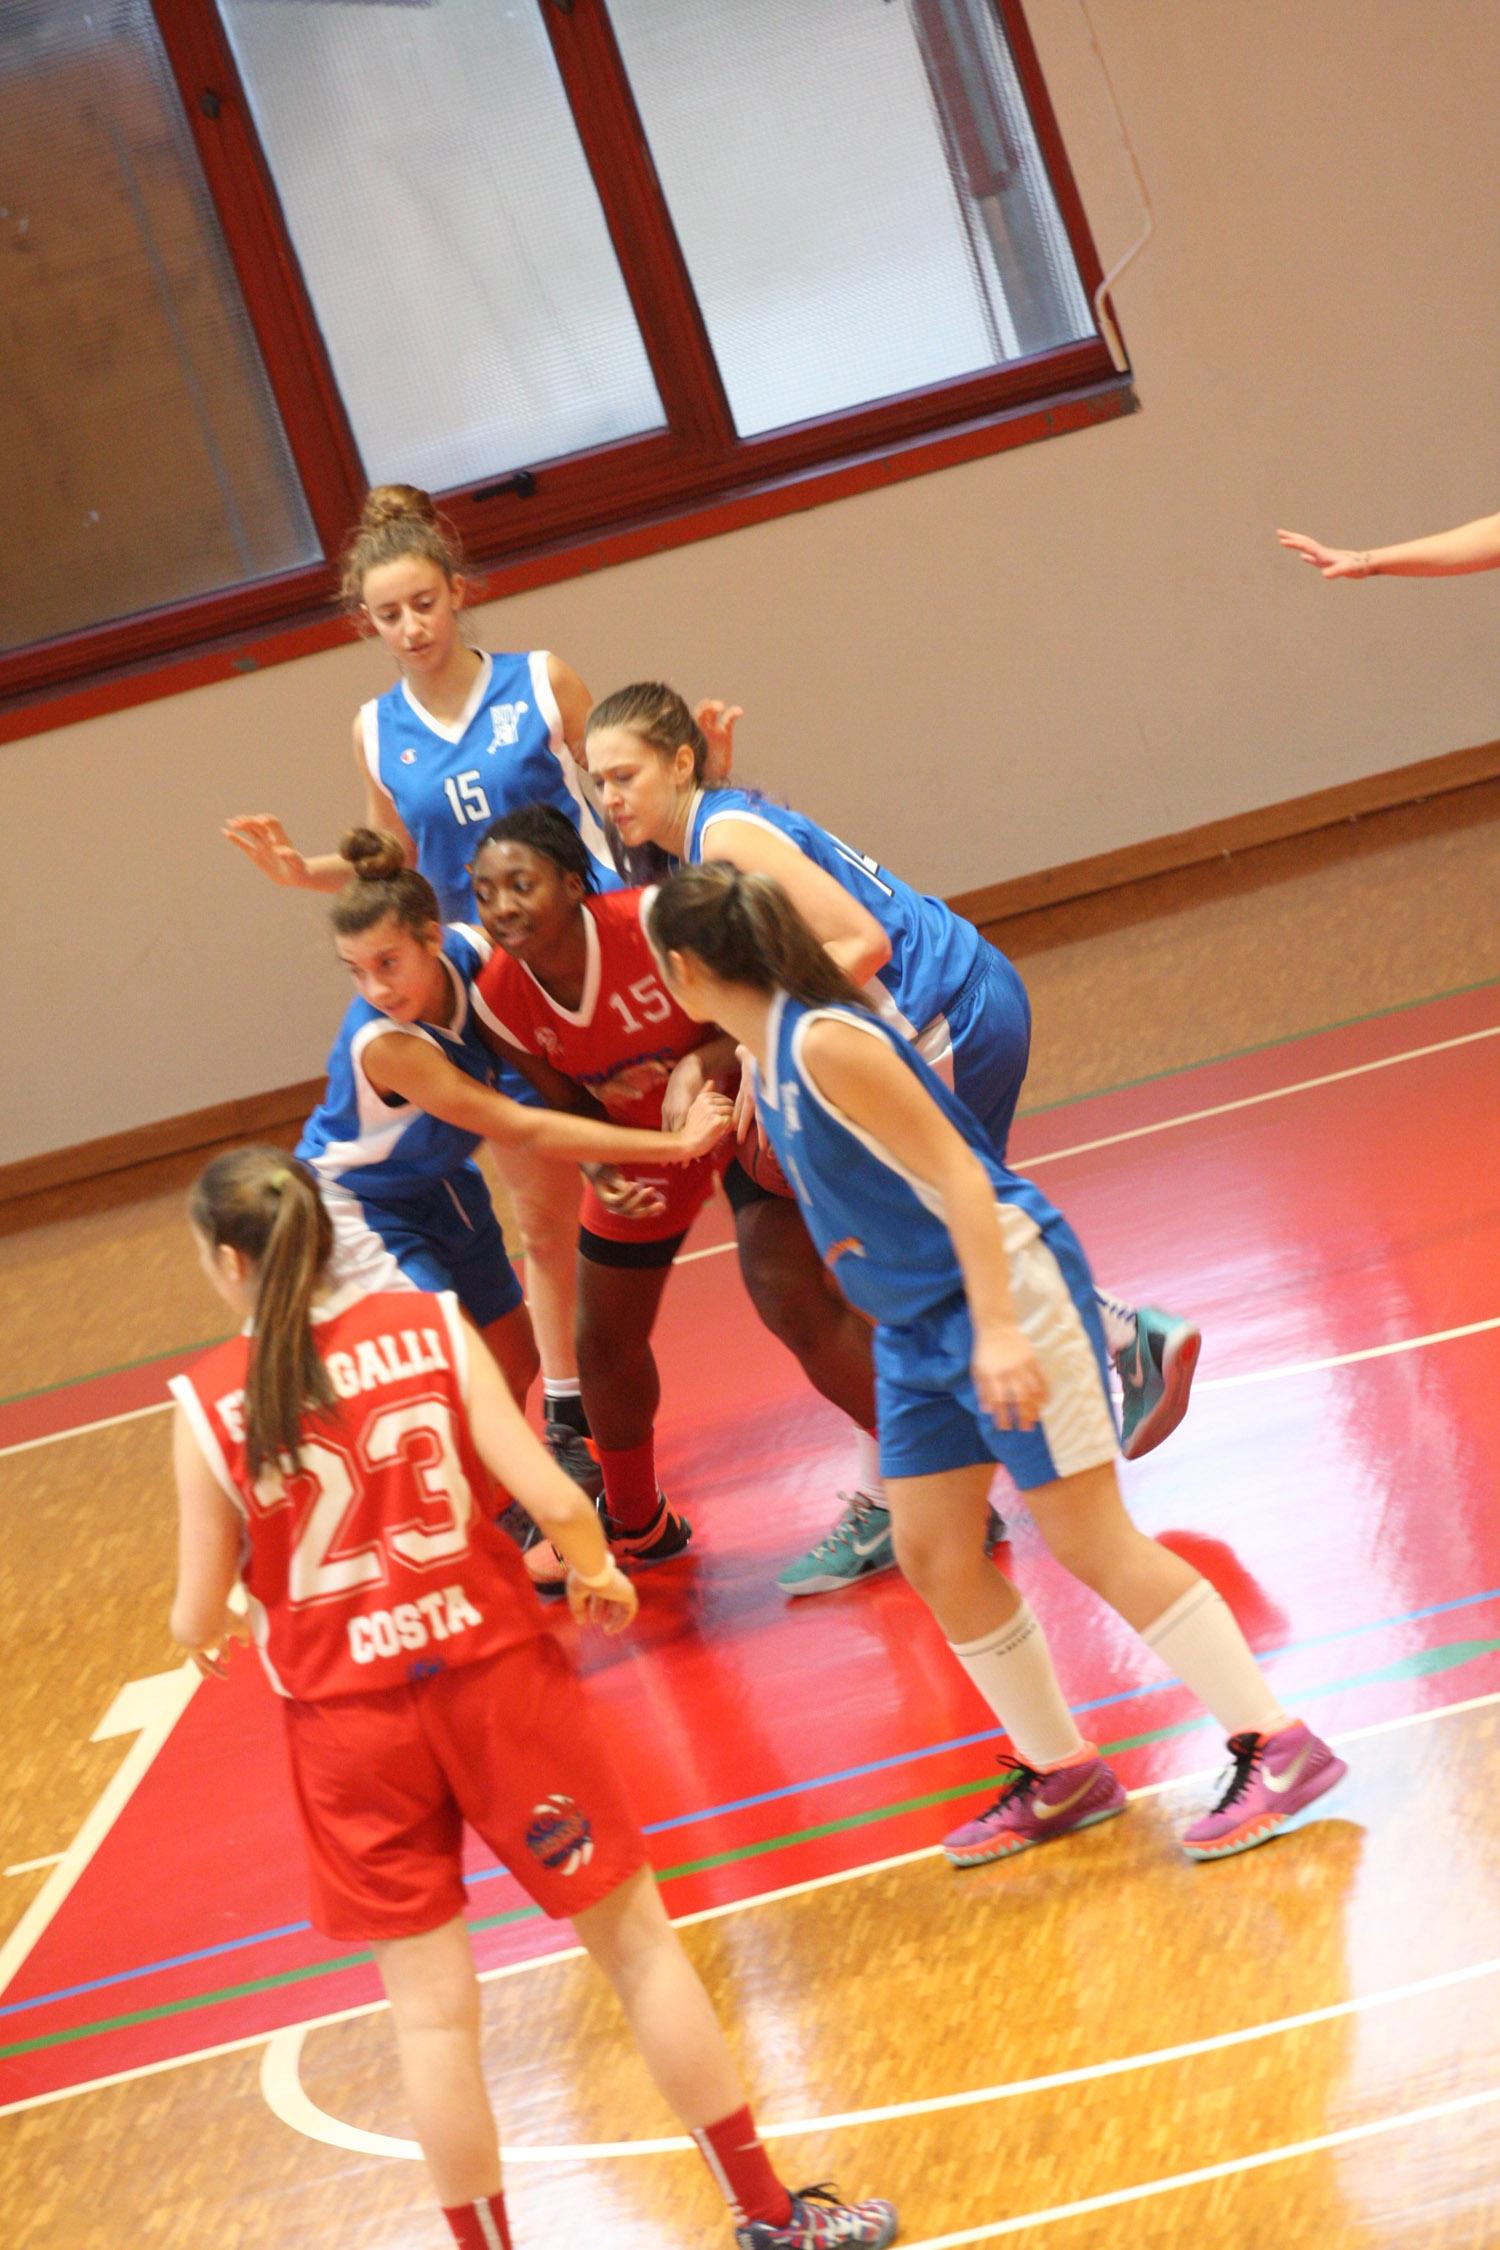 U16E - Costa Masnaga vs Baskettiamo Vittuone 2001 00036.jpg